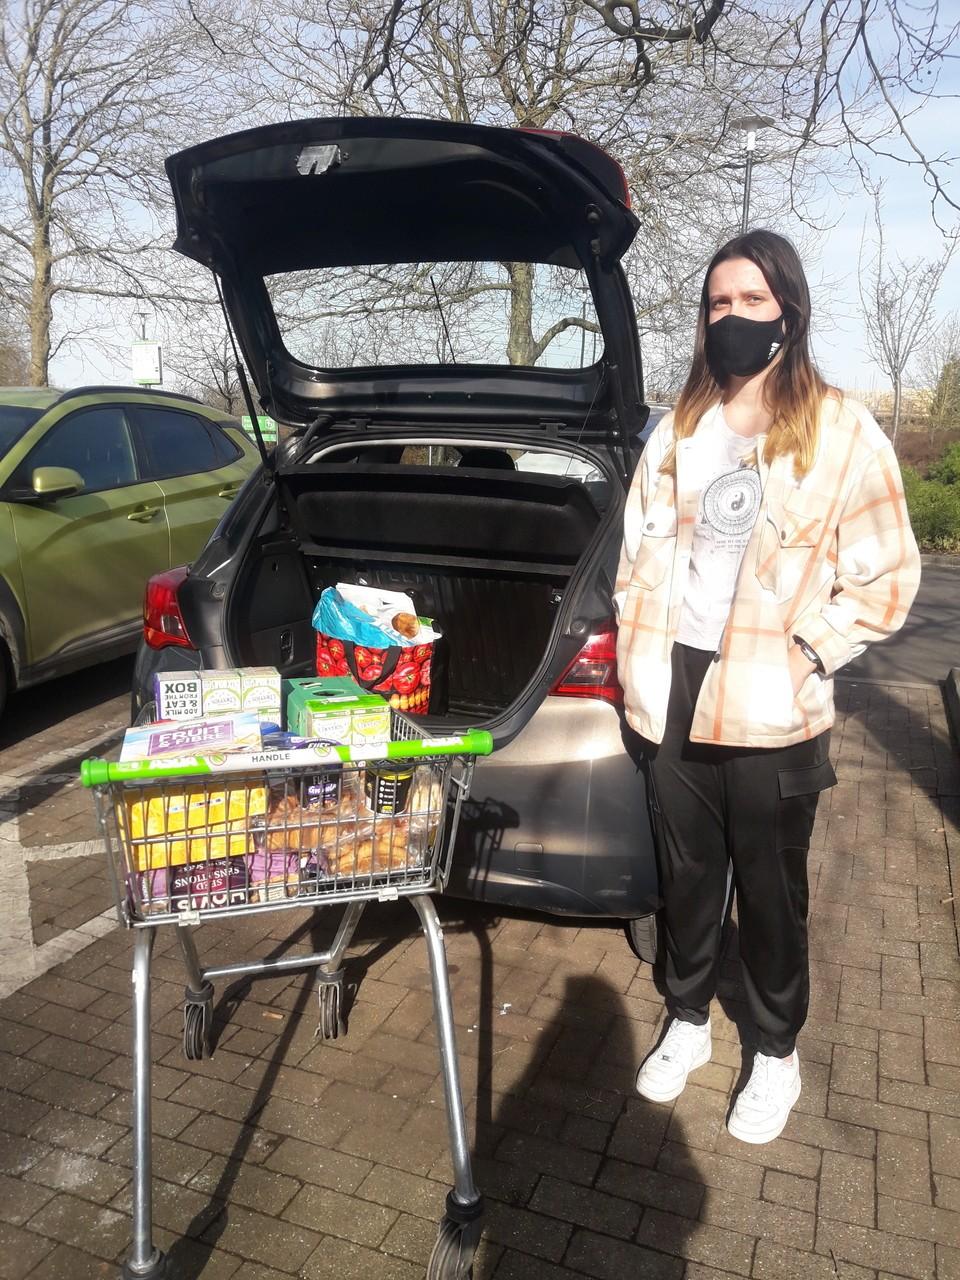 Project Wingman donation | Asda Kingshill